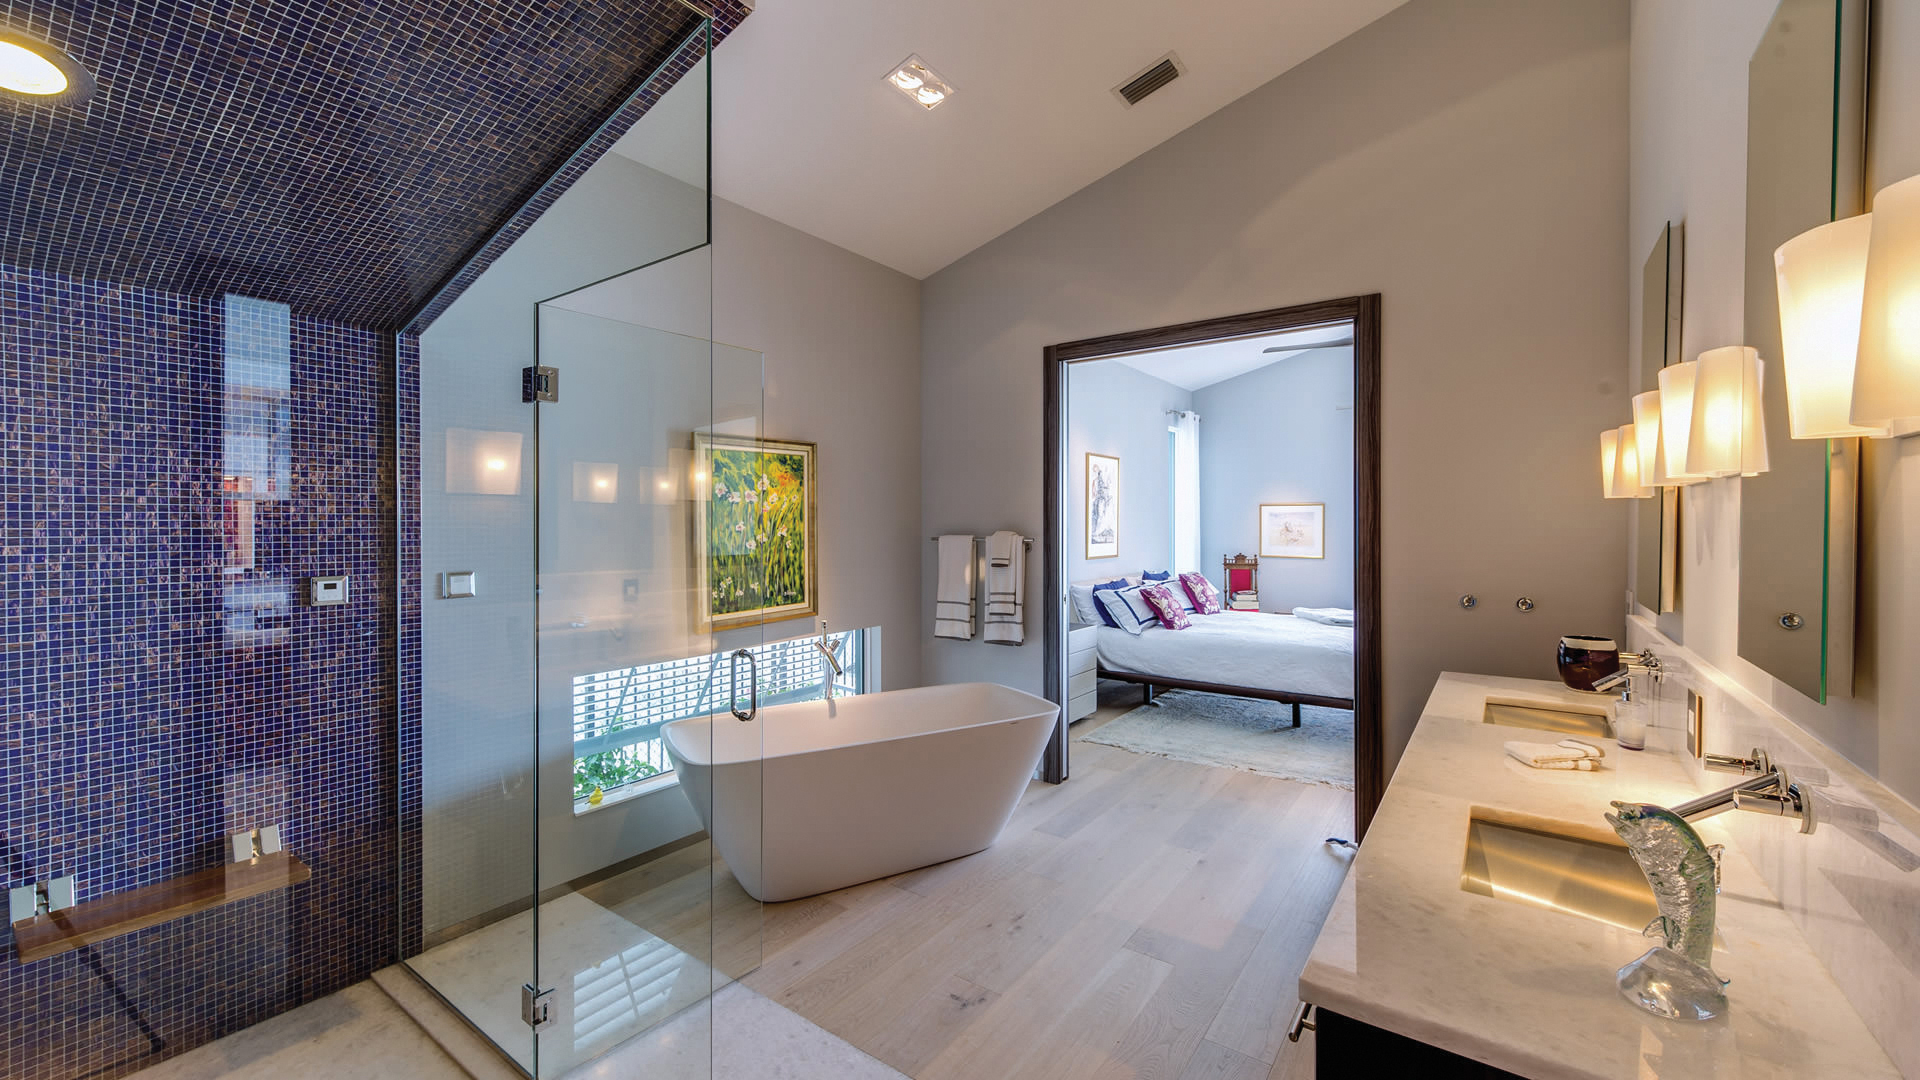 MasterBath2-gulfstream-homes-arcs-construction-your-home-magazine.jpg